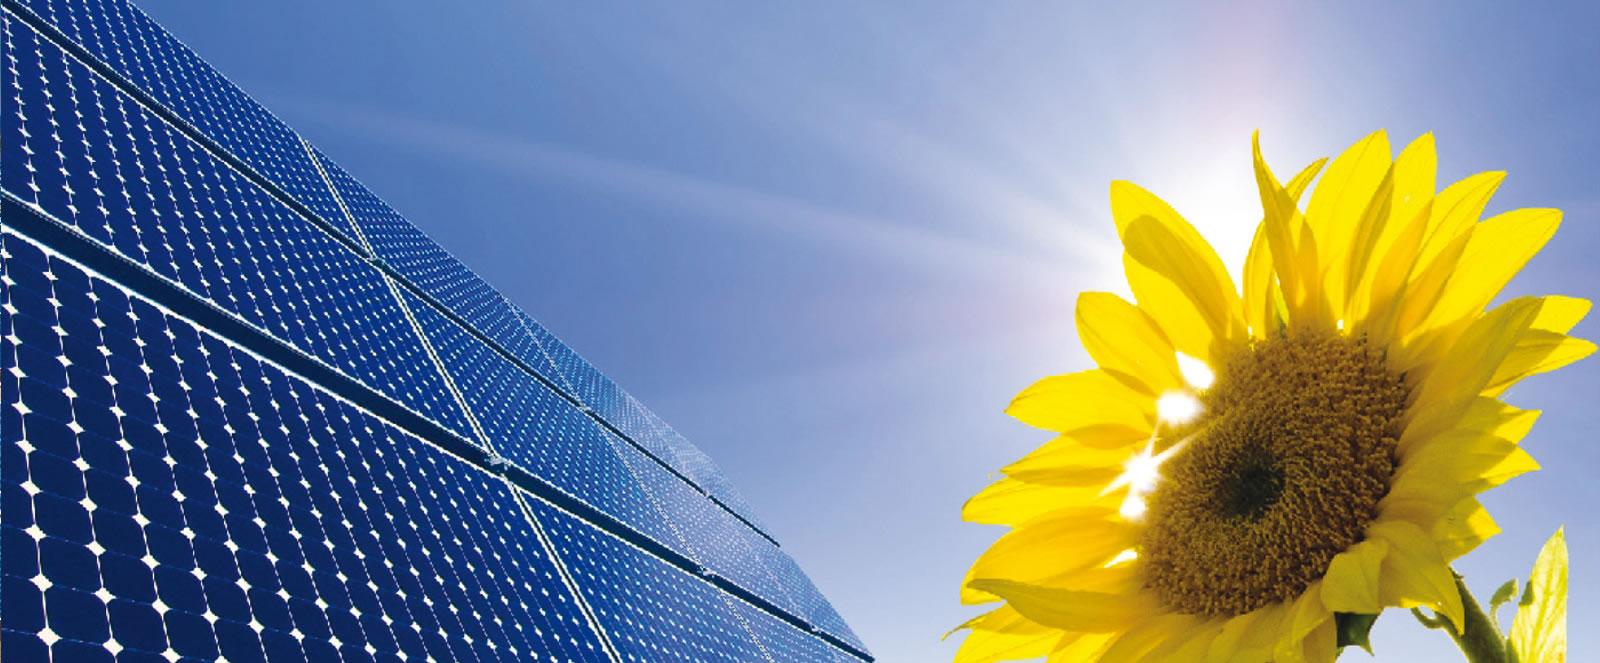 Energie rinnovabili, nuove regole dall'Unione Europea